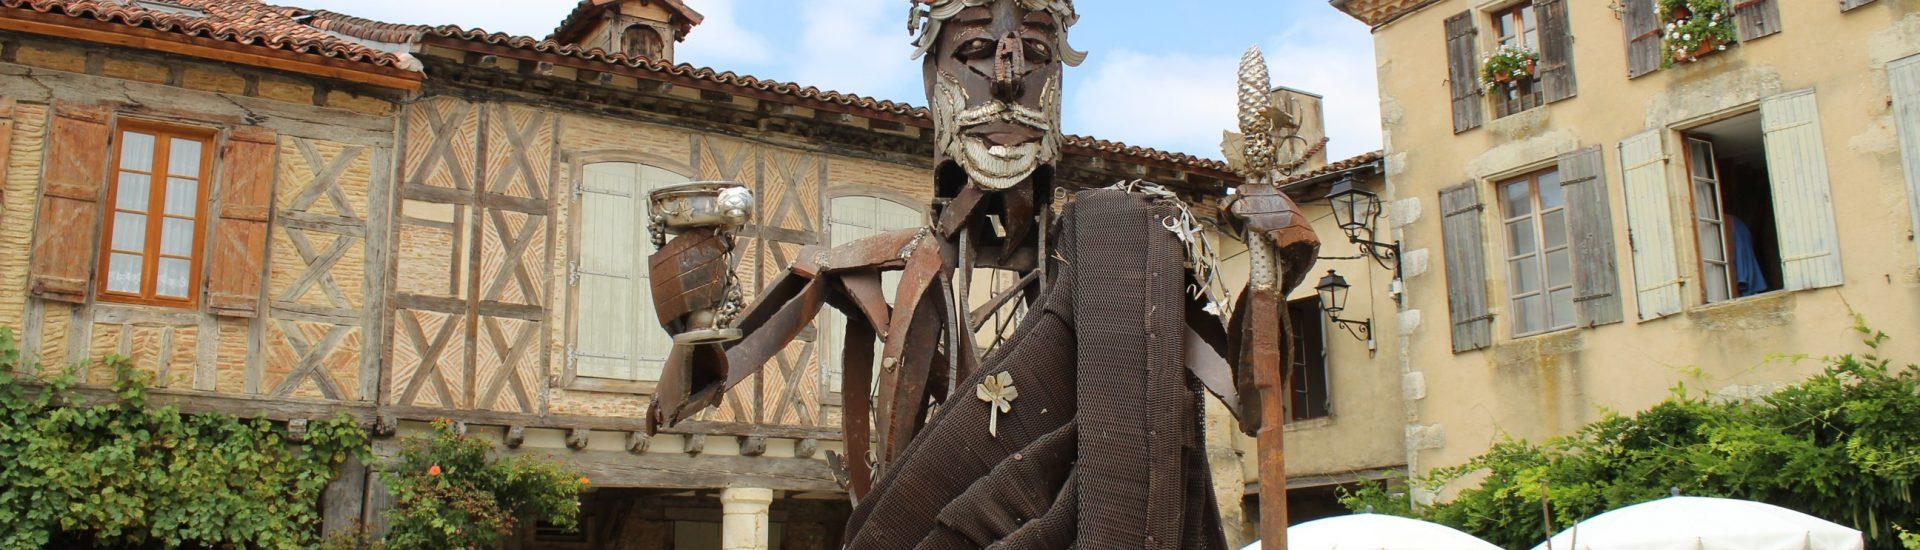 Turismo Armañac